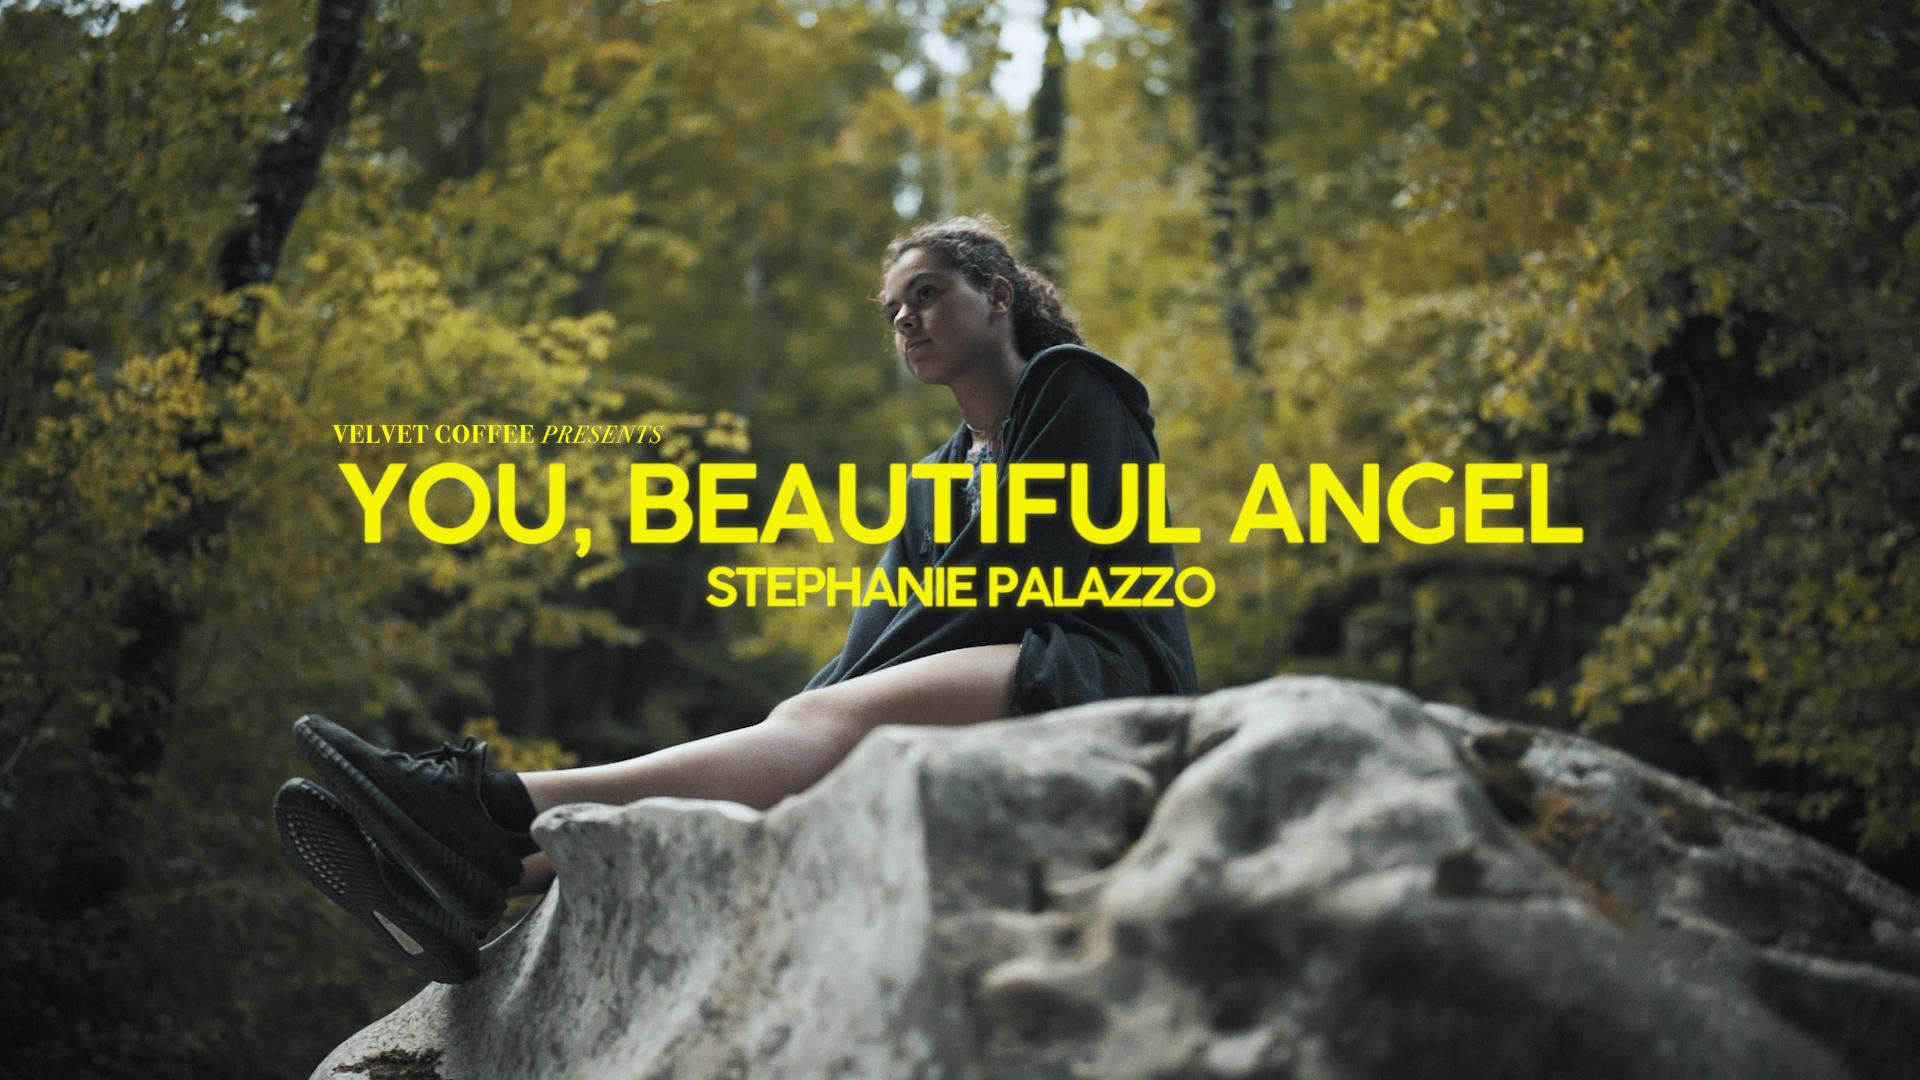 ✨ You, Beautiful Angel - le Clip 💛